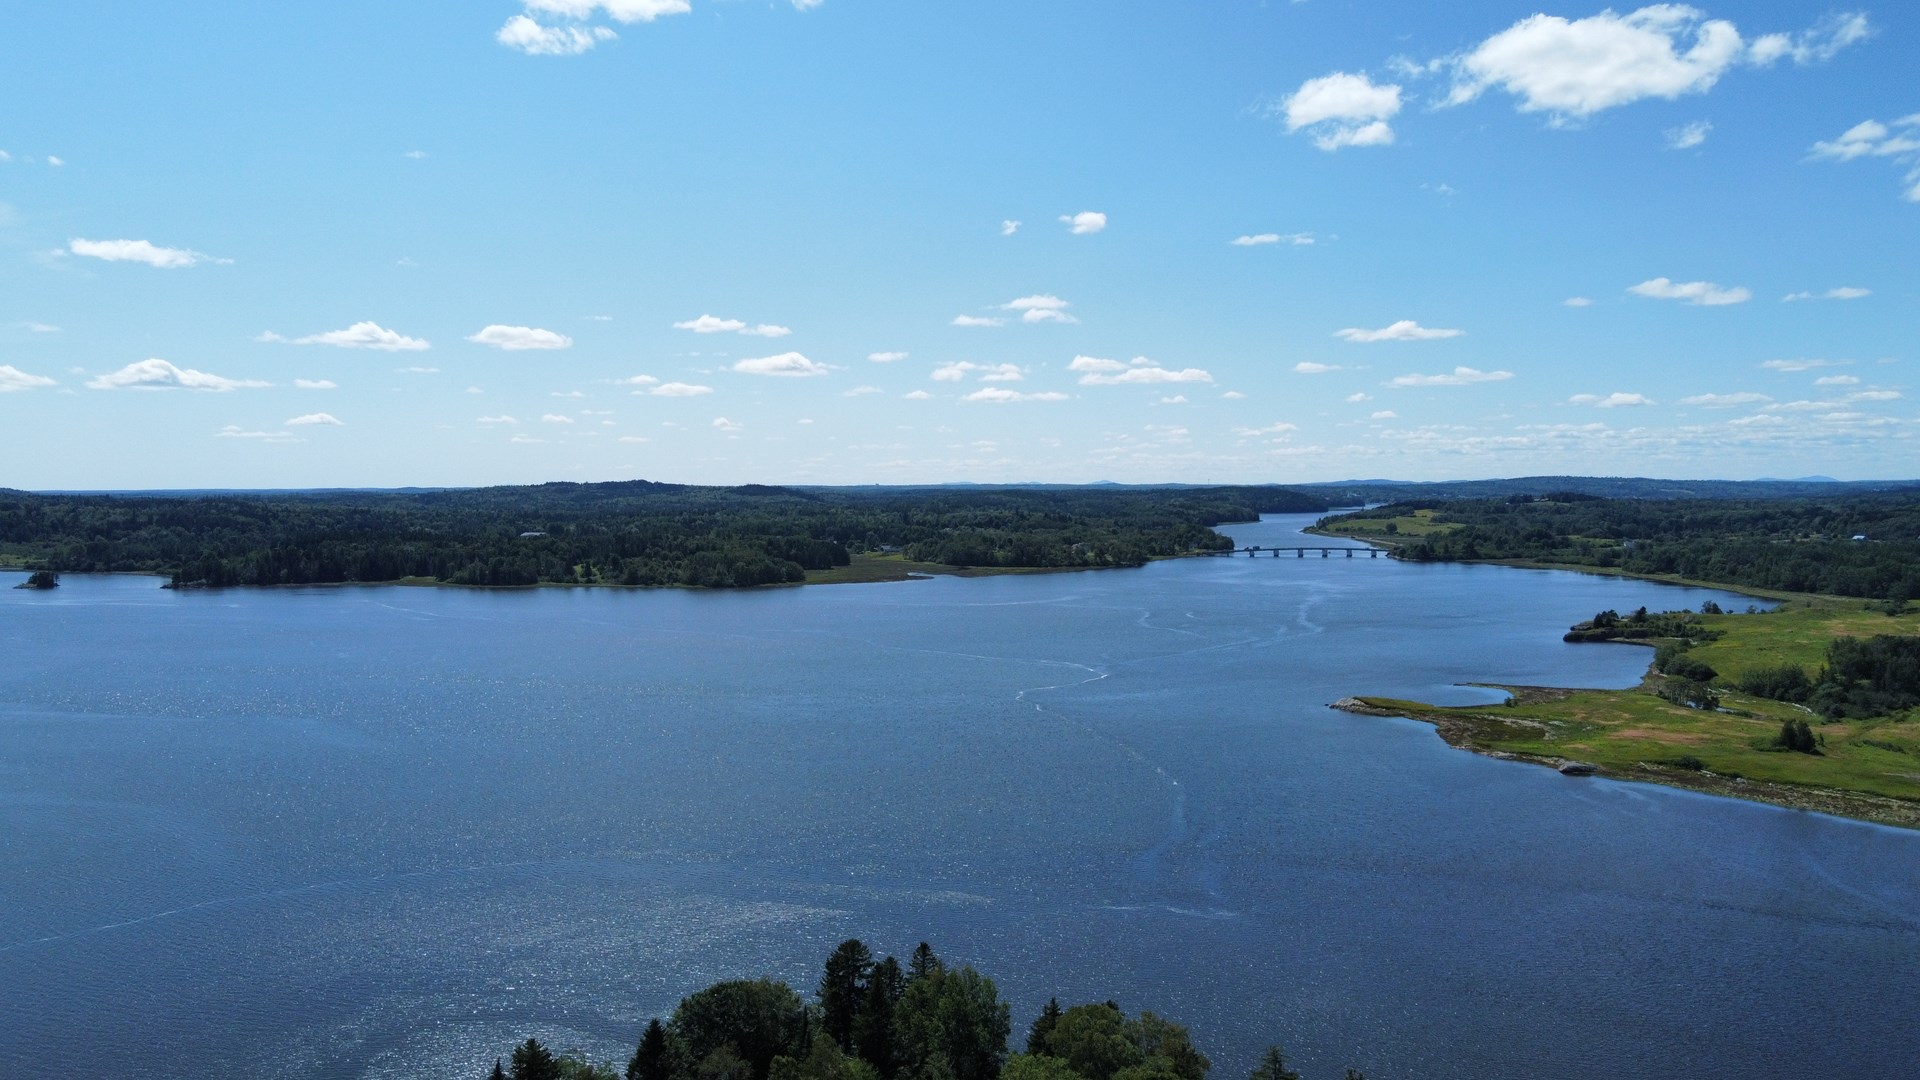 Land for sale in Machiasport, Maine